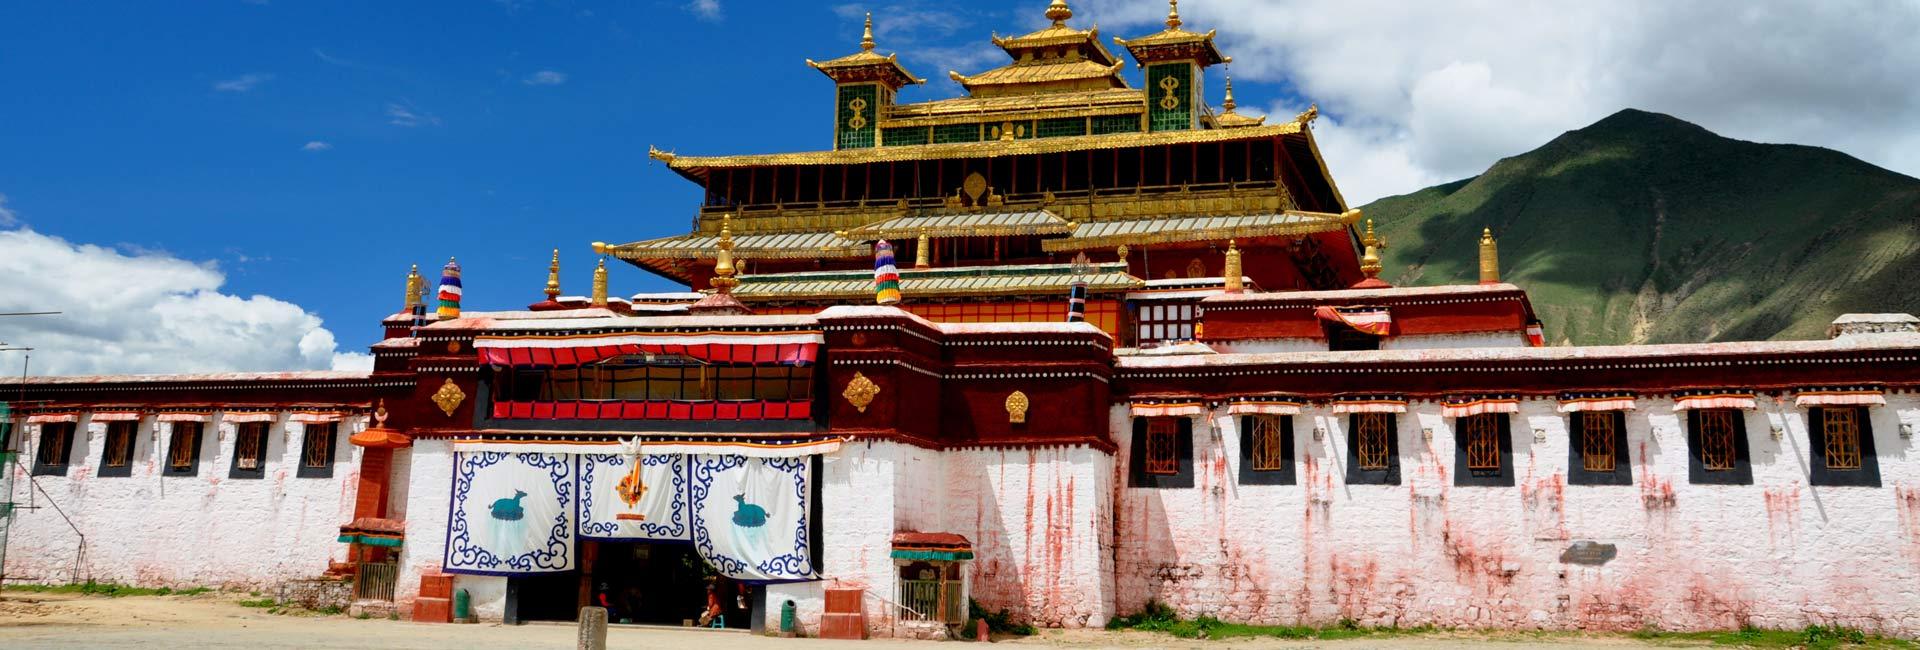 Central Tibet Tours Shigatse Tours Gyantse Tours - Tibet tours